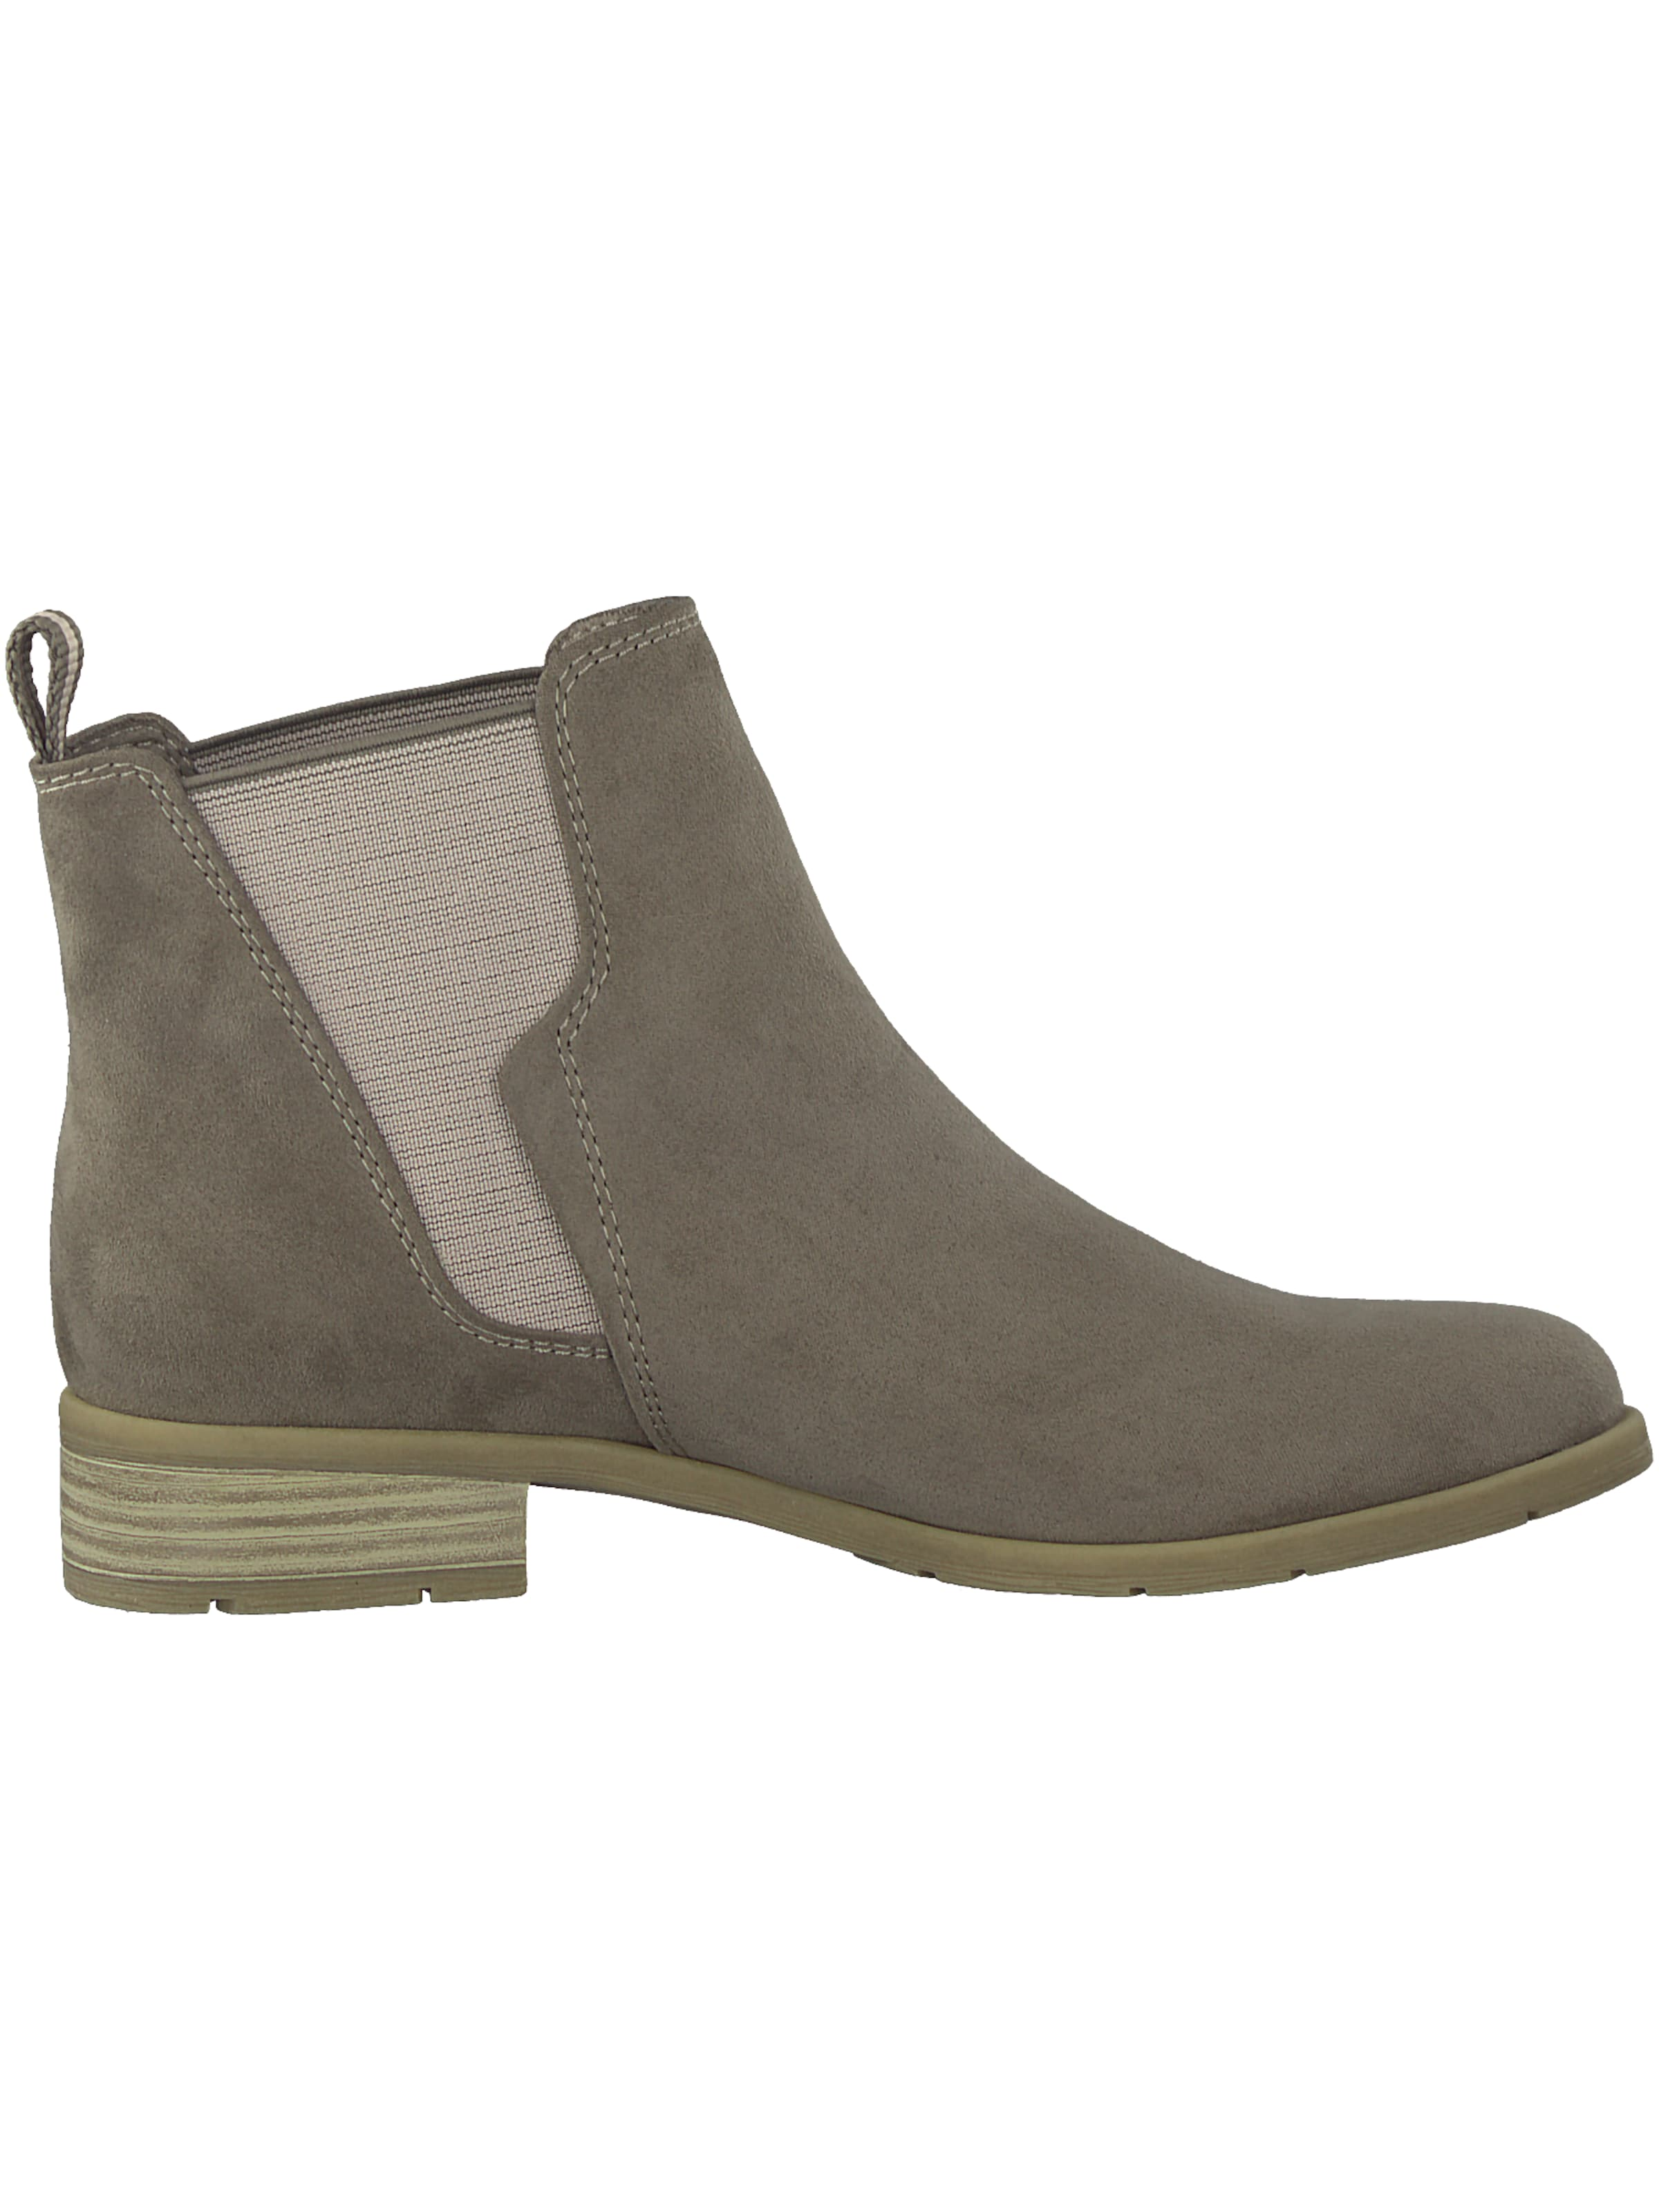 Boots Taupe En Tozzi Marco Chelsea FlTJcuK13